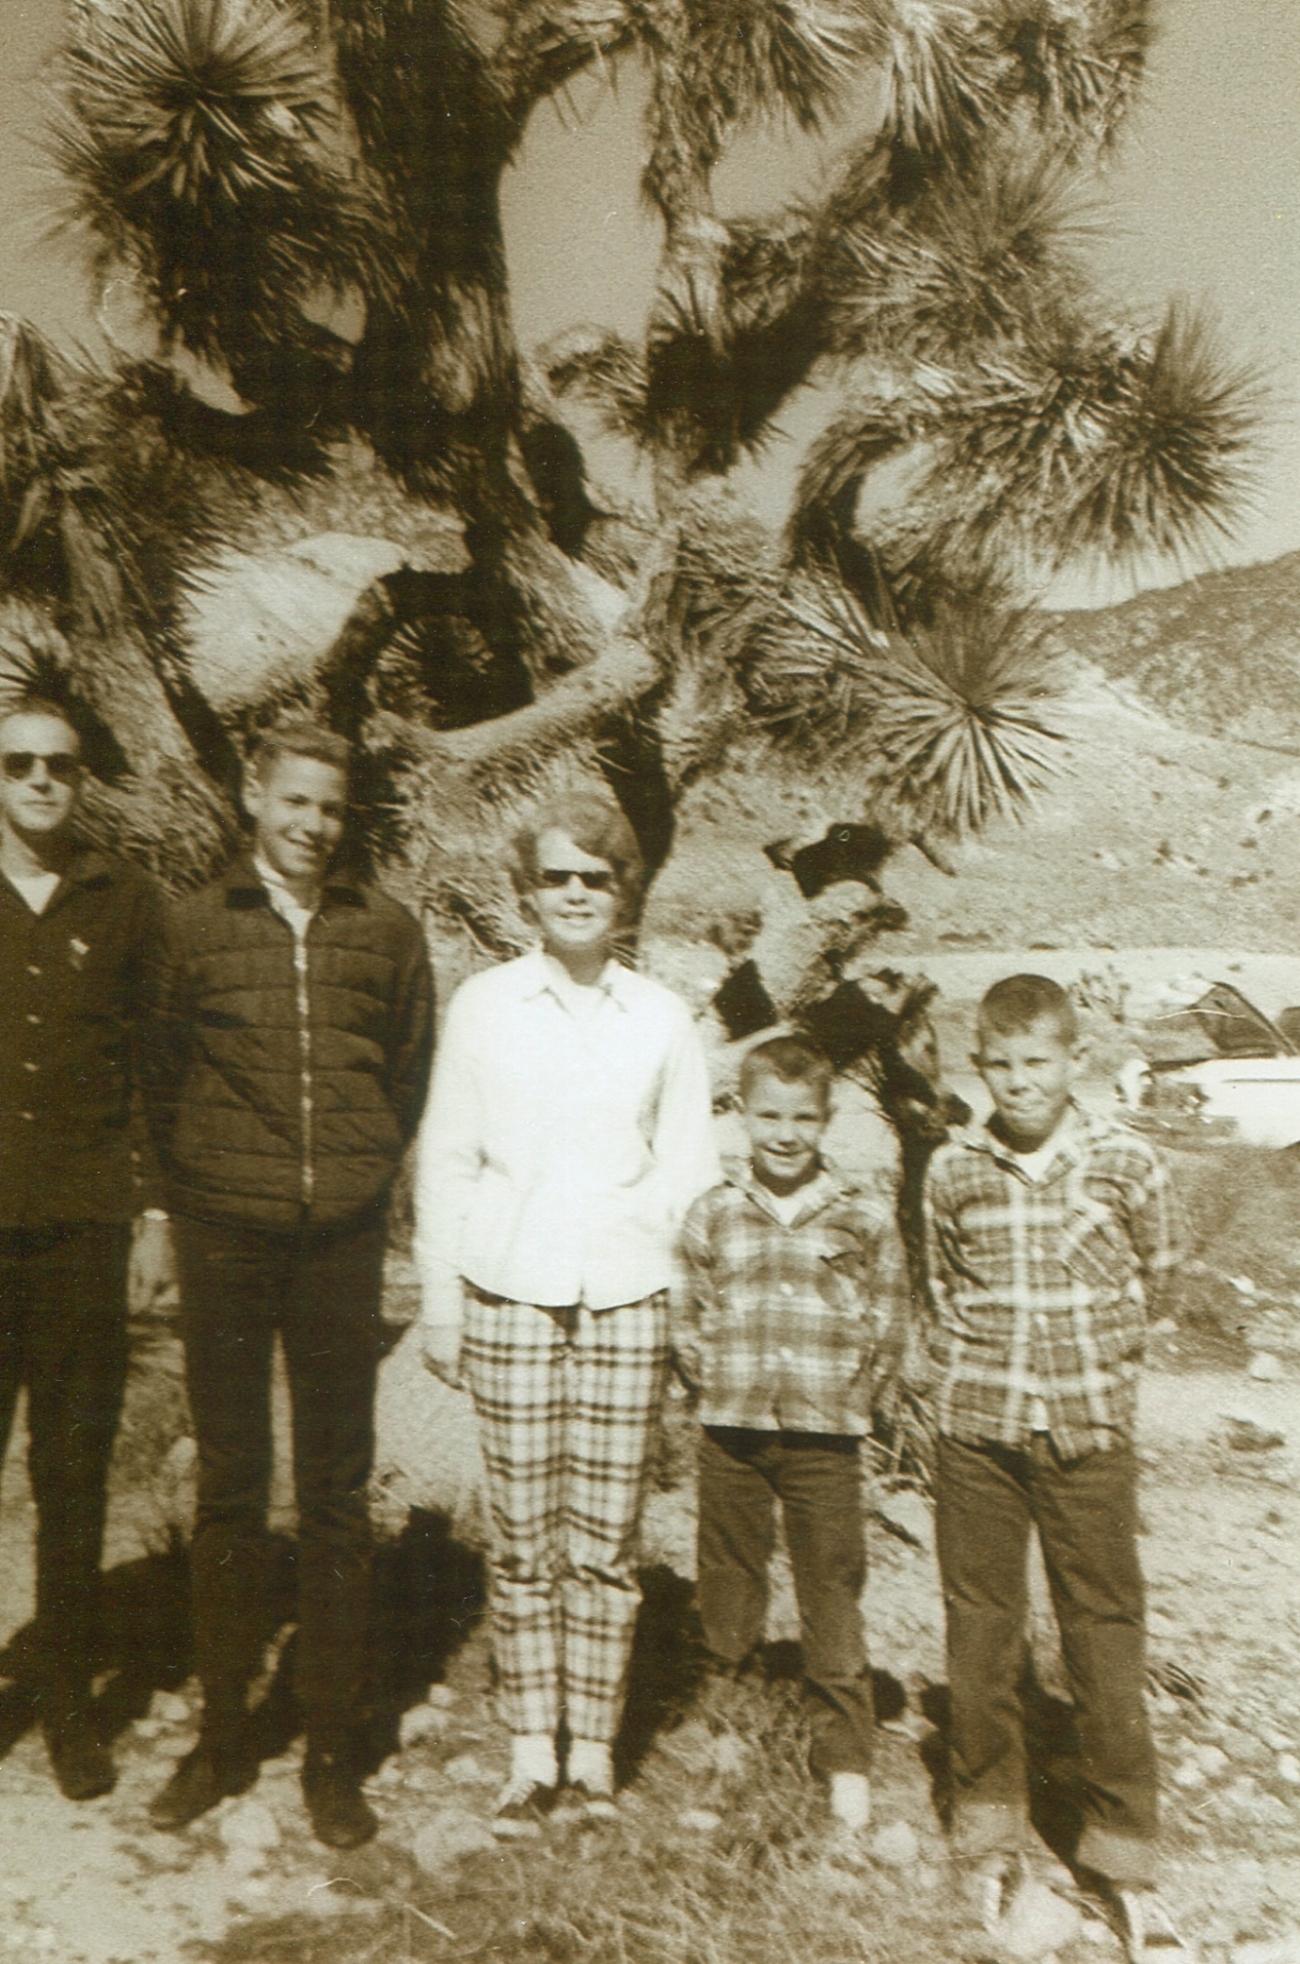 Pop, Steve, Cyndy, John and me on trip to California